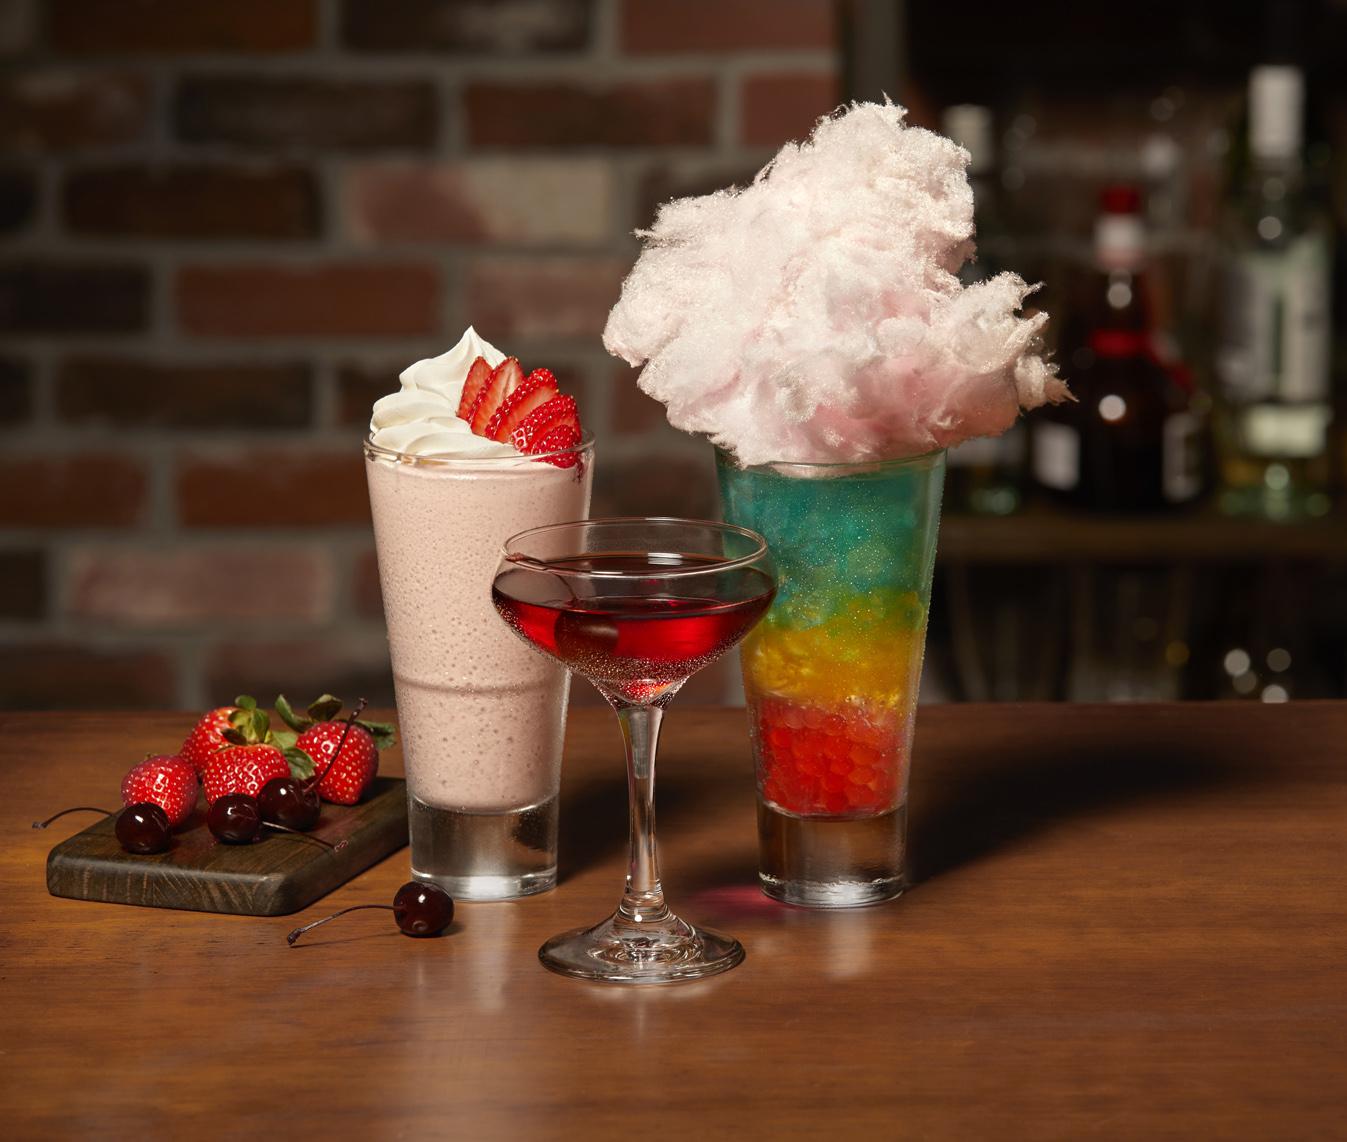 Limited-Time Cocktails: Strawberry Shortcake, Bordeaux Cherry Manhattan, Electric Unicorn (l to r)